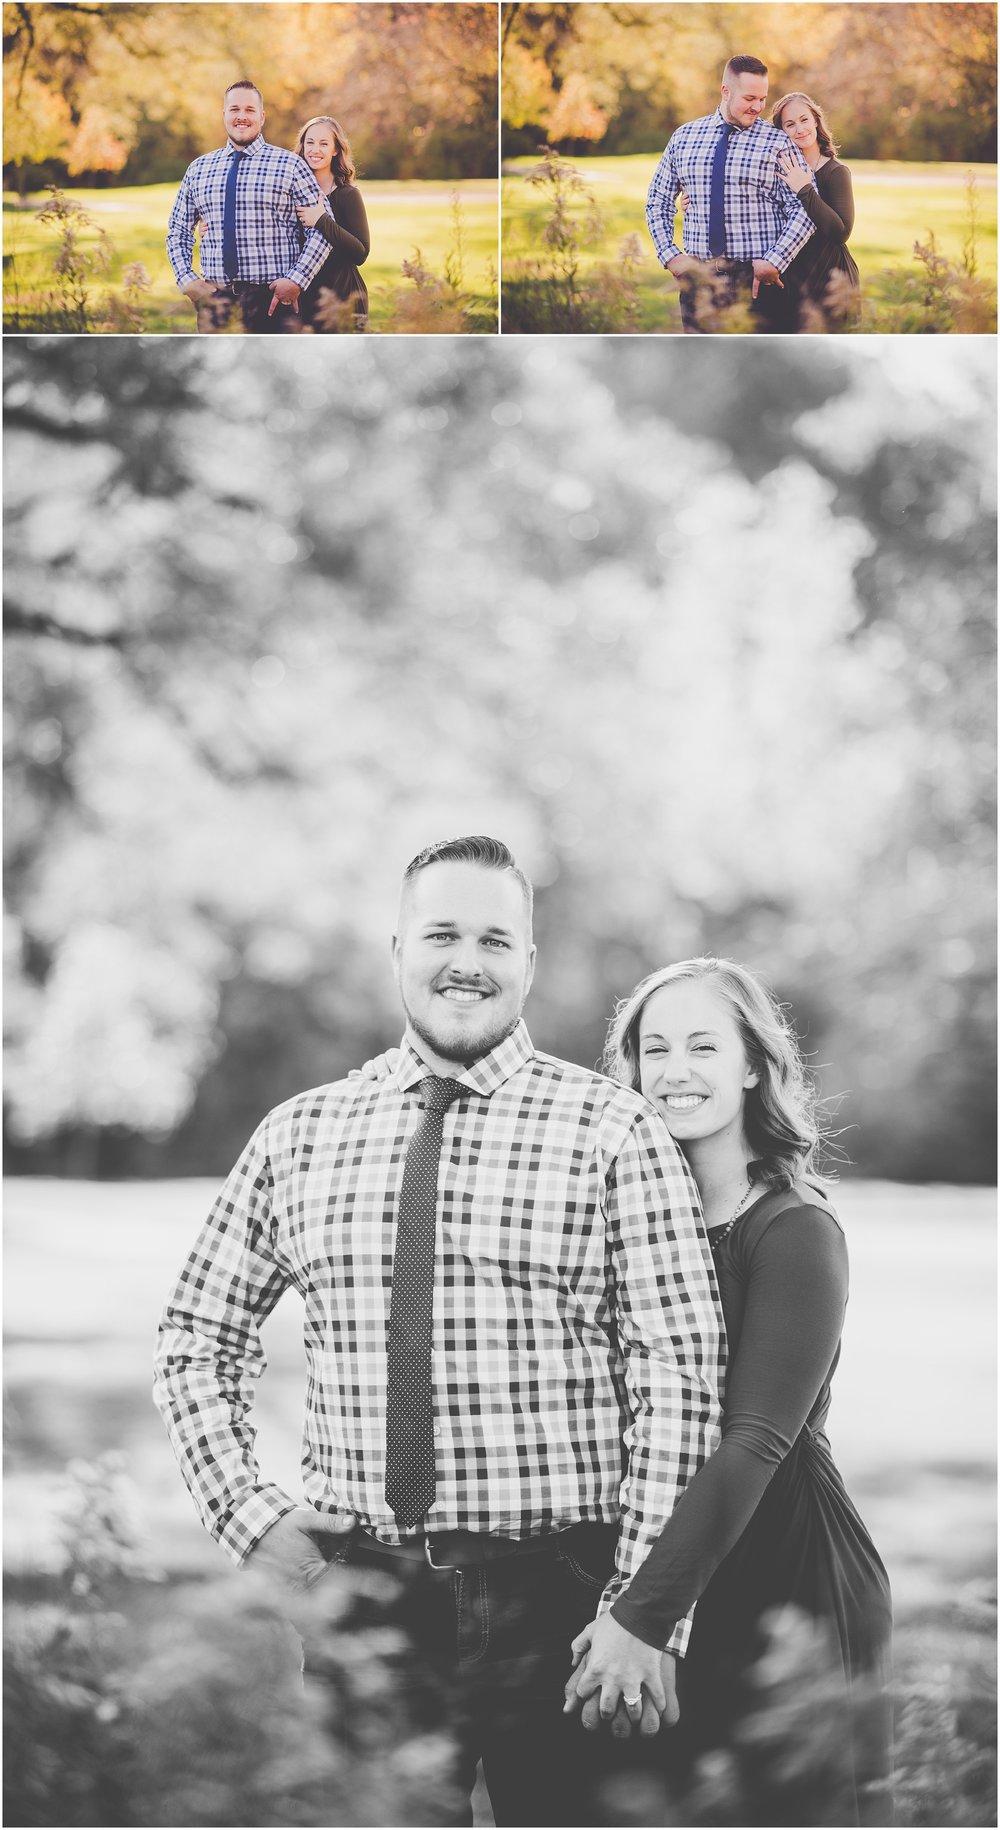 Kara Evans Photographer - Central Illinois Wedding Photographer - Iroquois County Engagement Photographer - Fall Engagement Photos - Fall Farm Engagement Photos